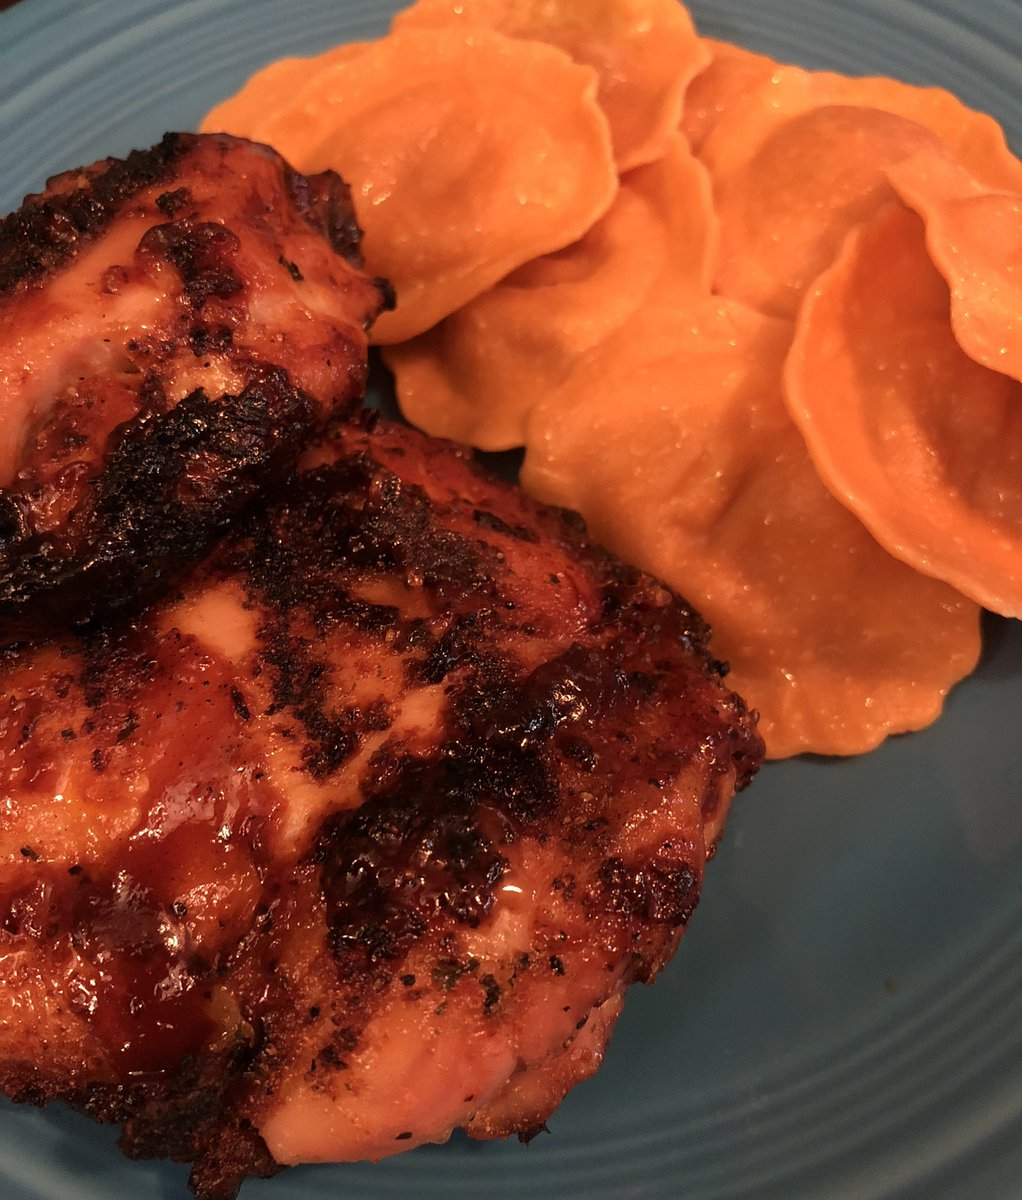 @PascoSheriff #dinner tonight. BBQ 🍗 & #autumn butternut squash ravioli 🤤🤤 #yum https://t.co/jhuQ1CeuVT